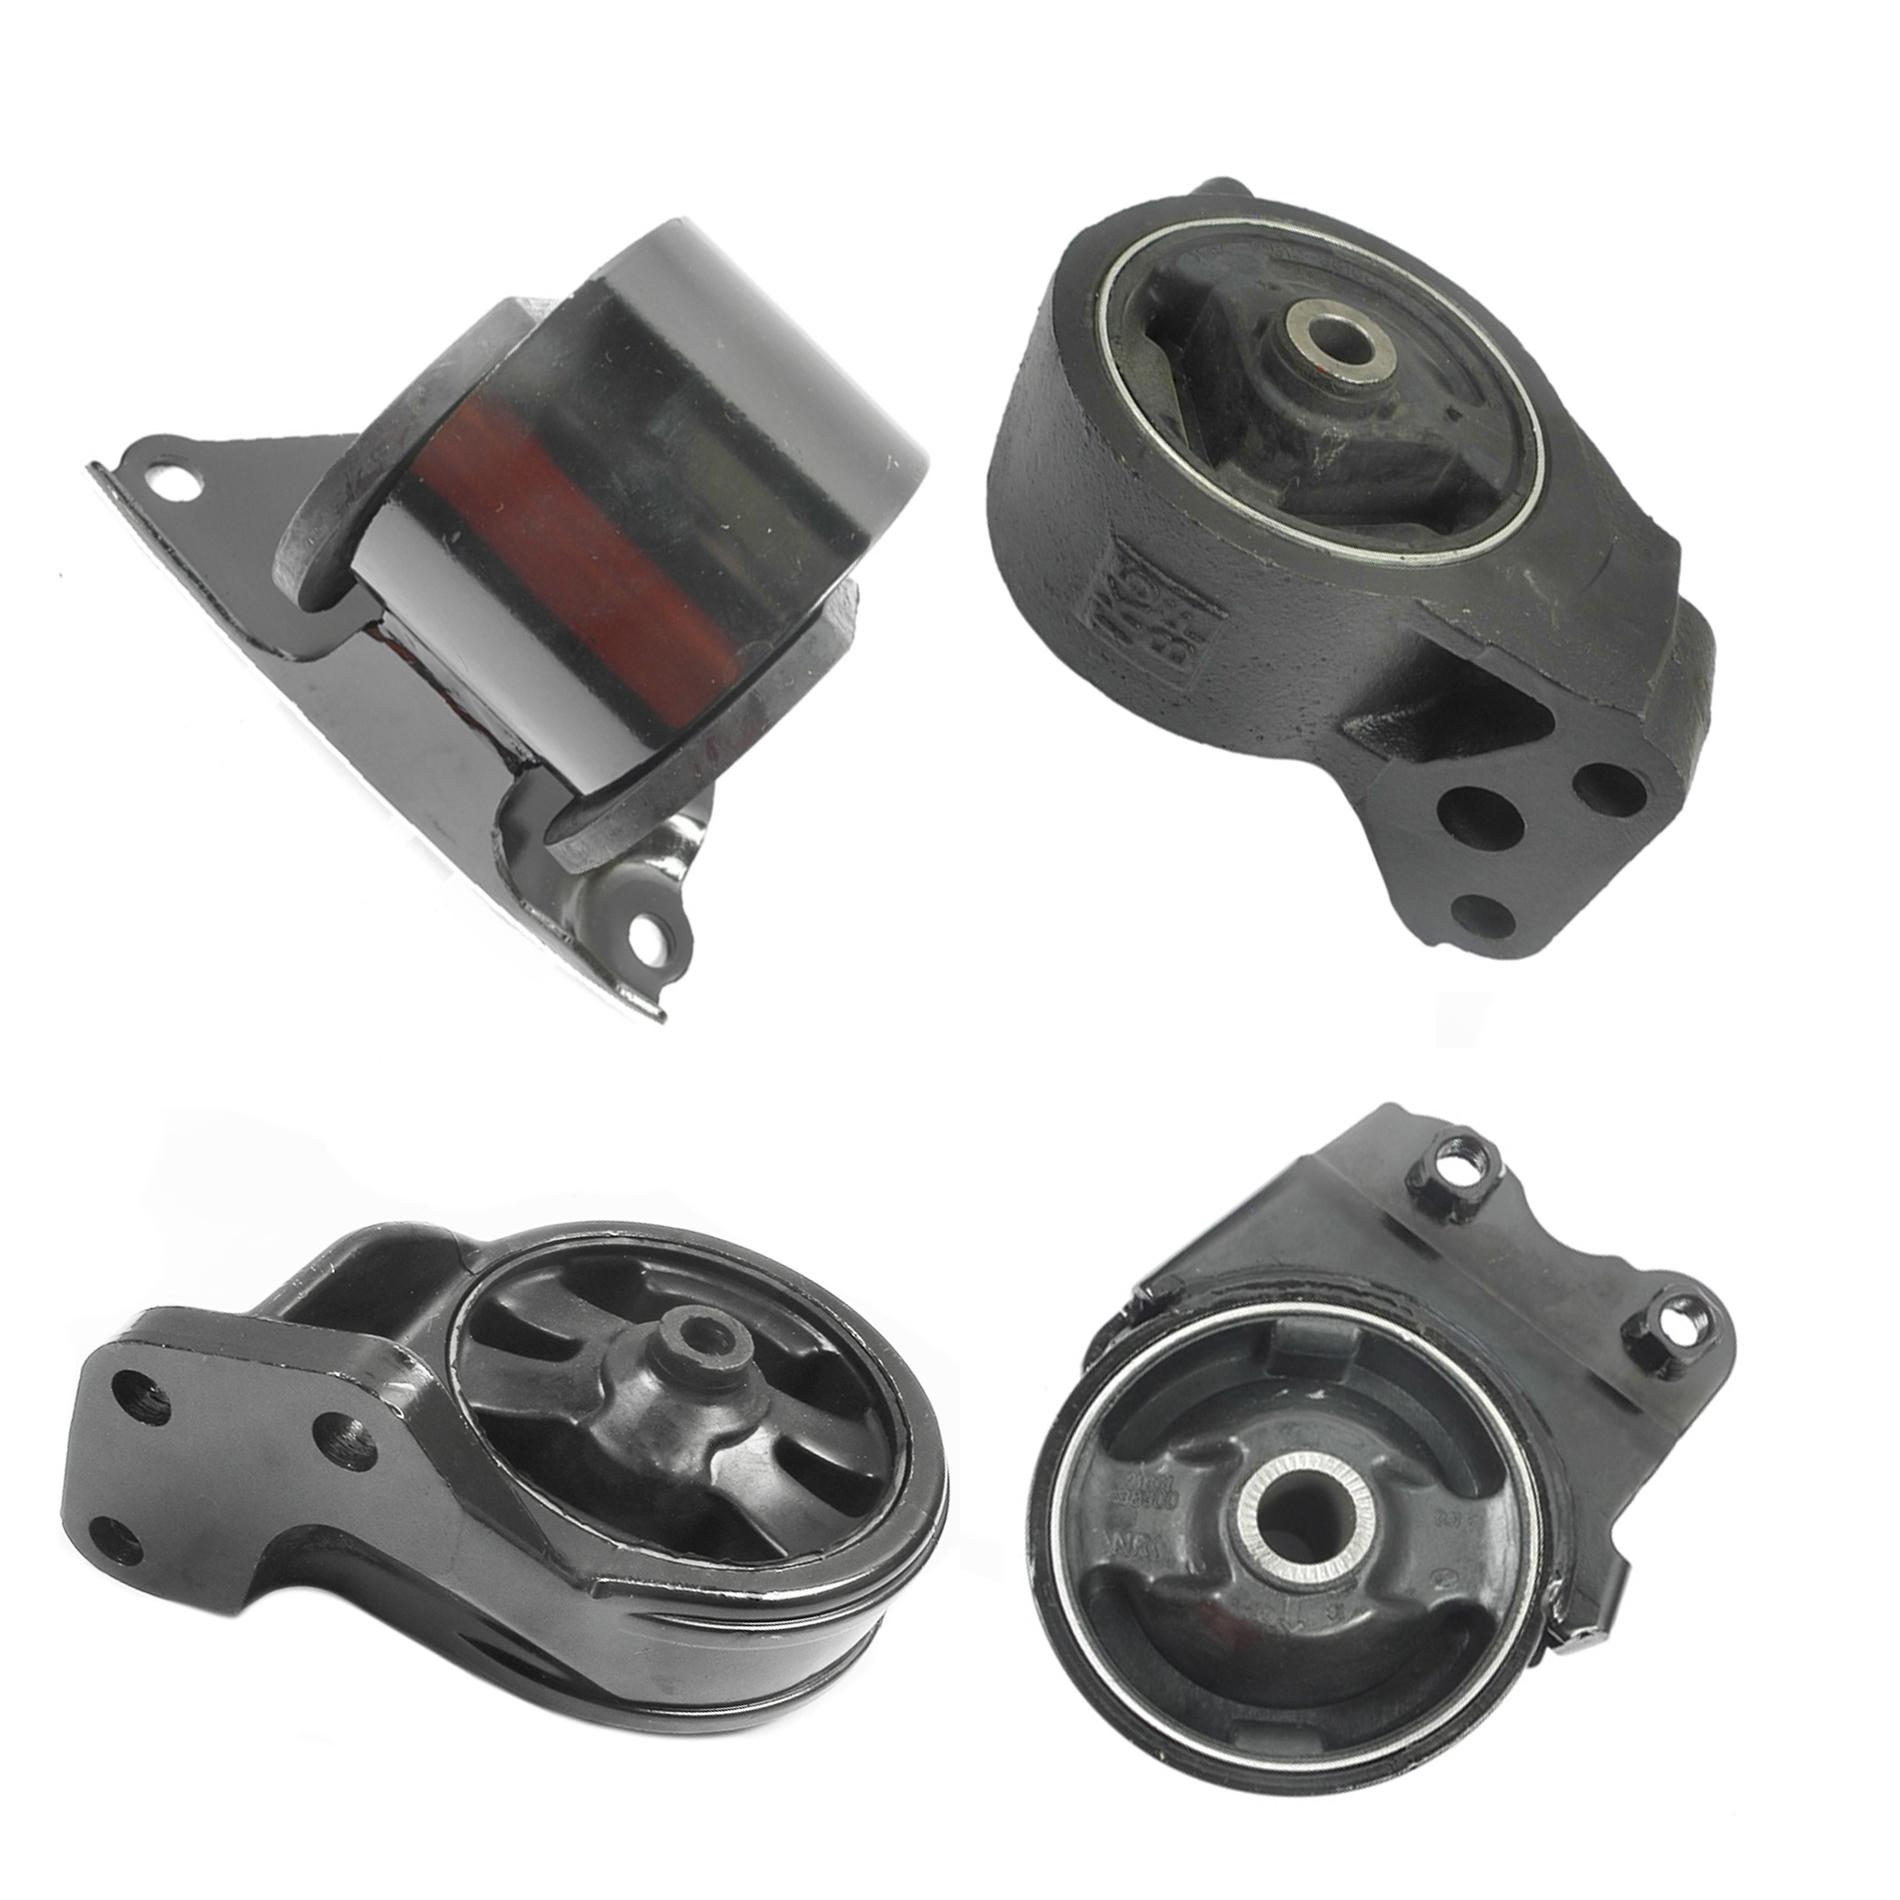 Transmission Engine Motor Mount 7117 For Hyundai Sonata Kia Optima Magentis NEW